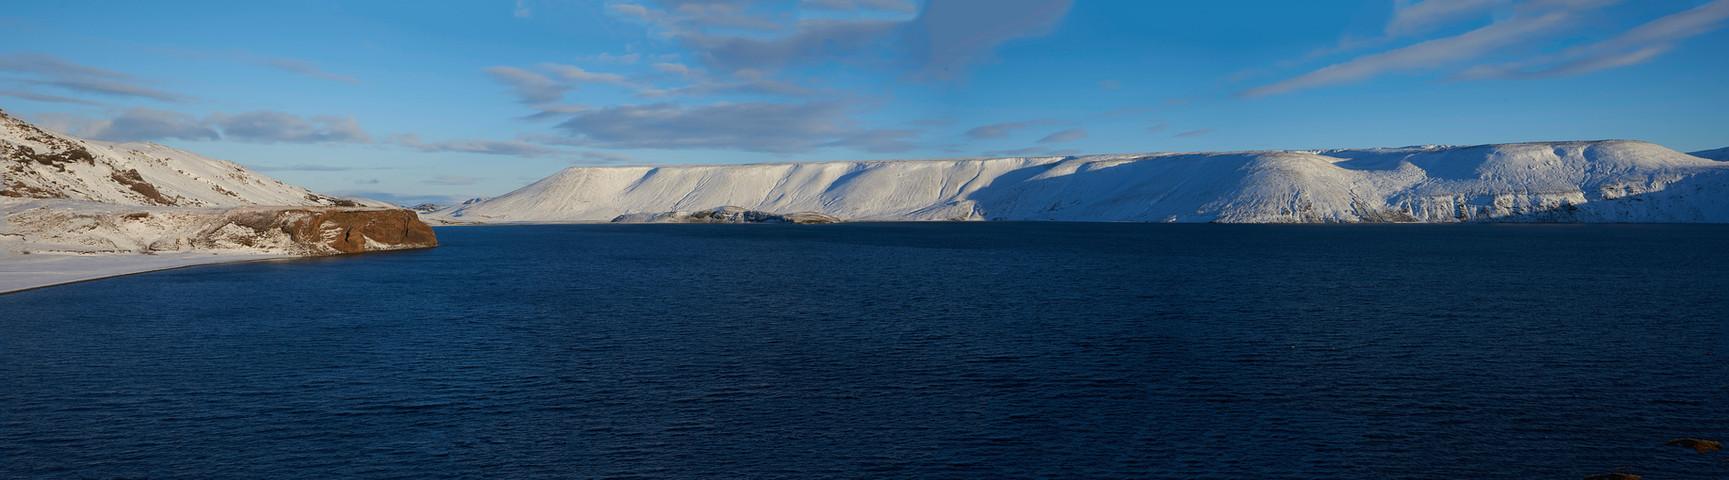 Iceland Pano